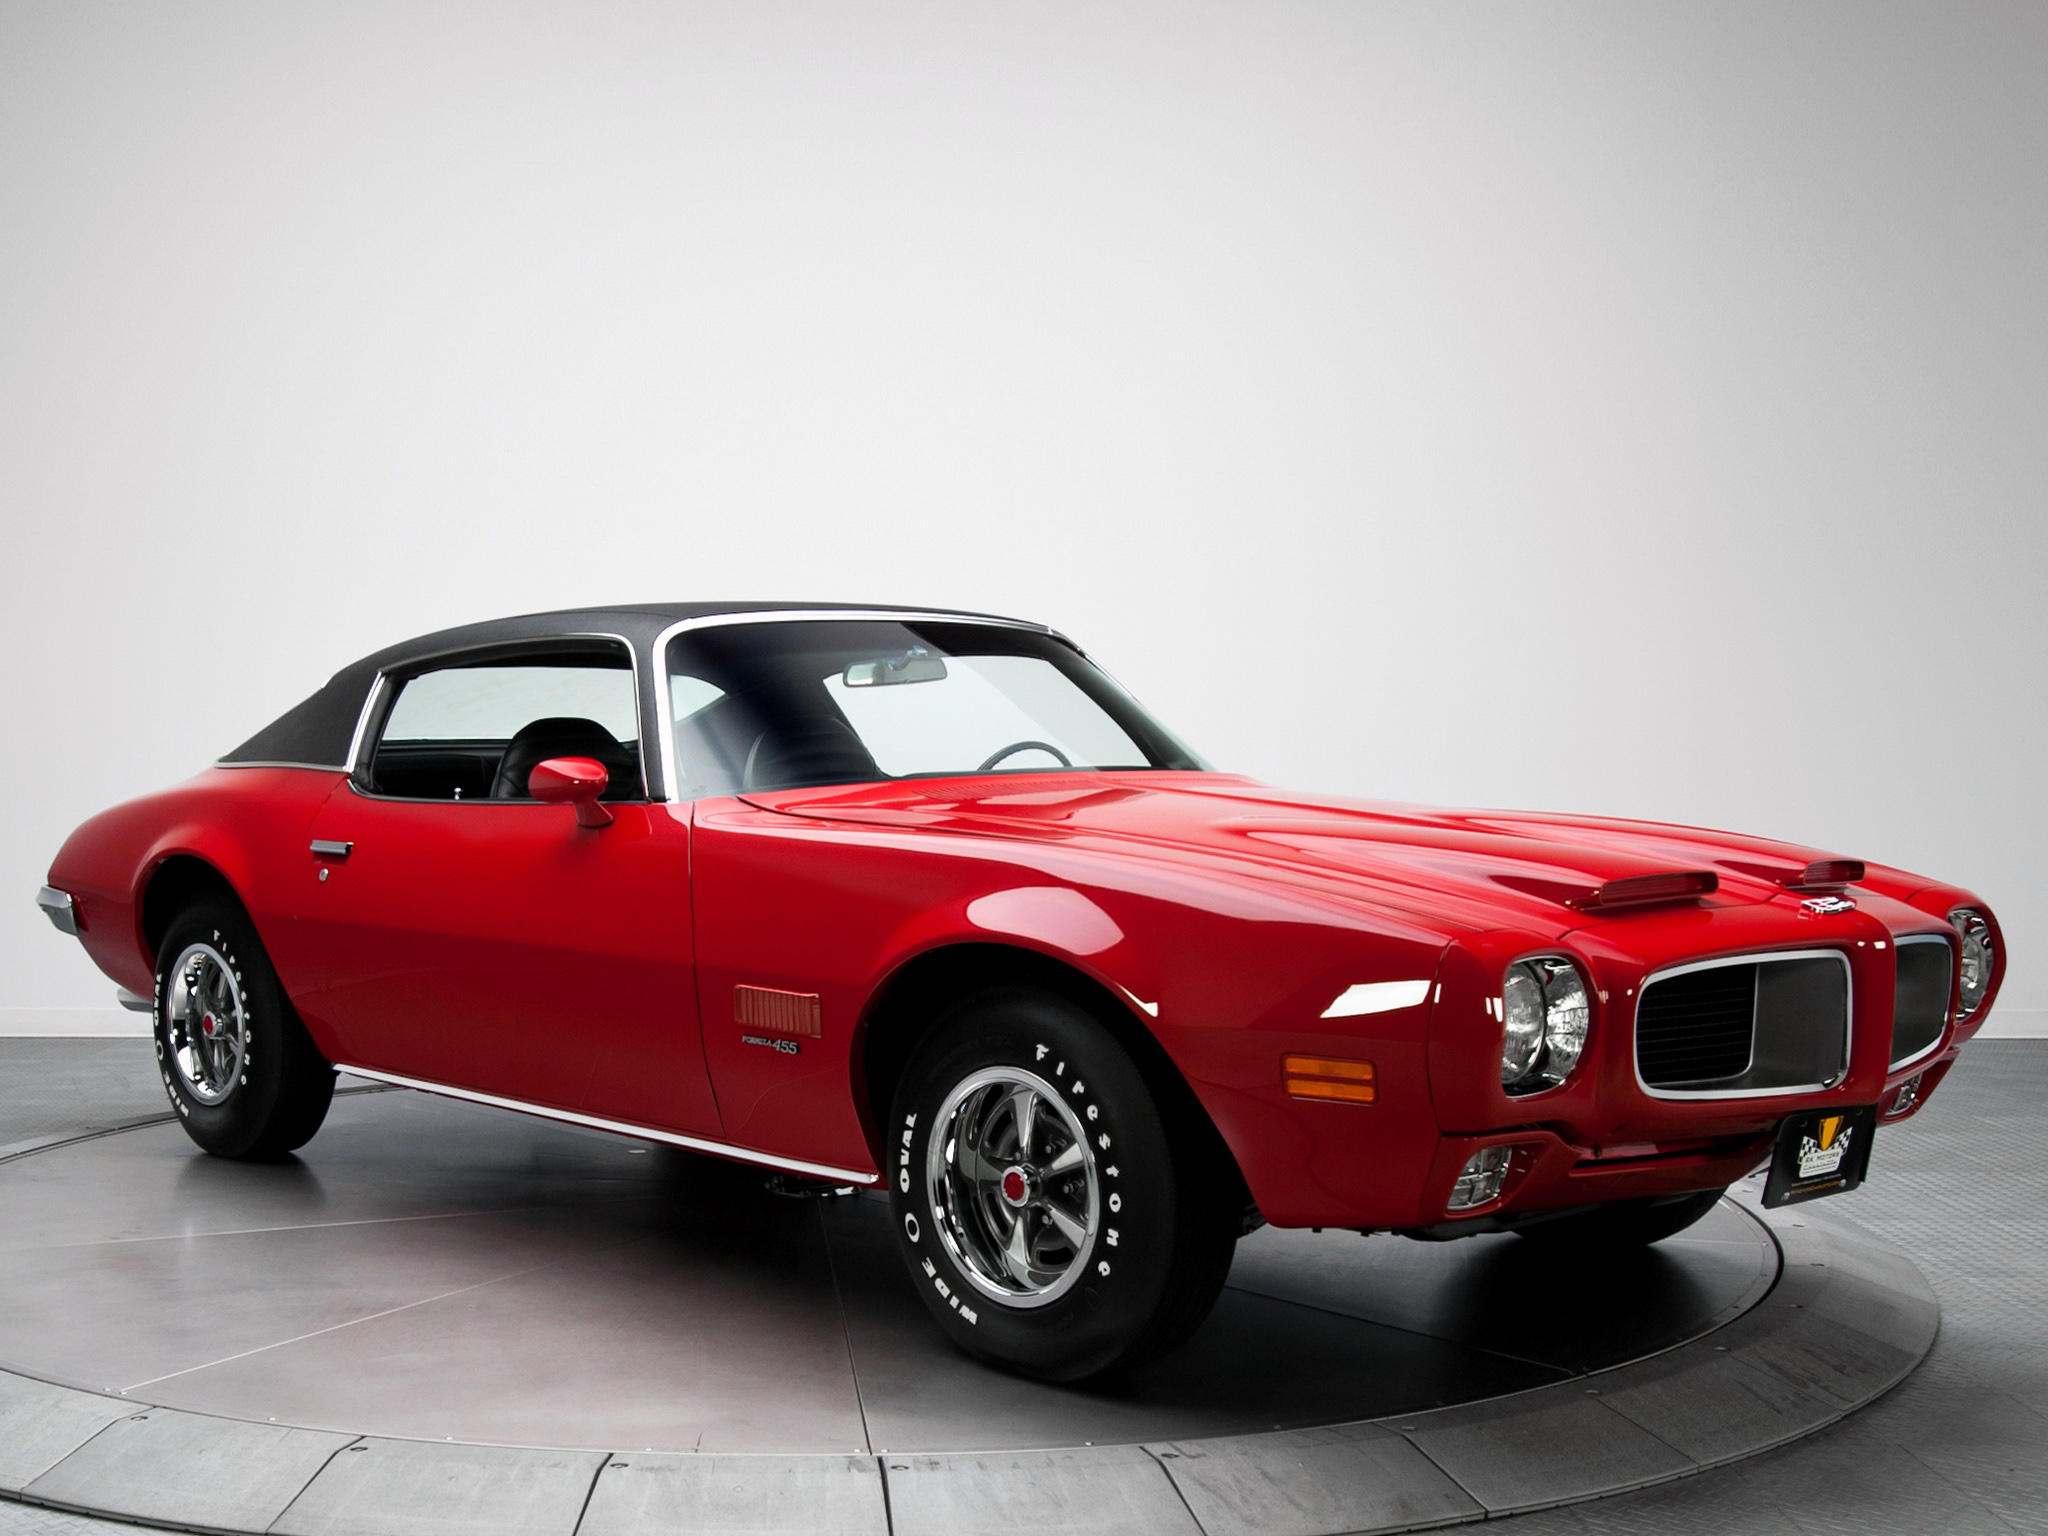 1971 pontiac firebird formula 455 muscle classic t. Black Bedroom Furniture Sets. Home Design Ideas